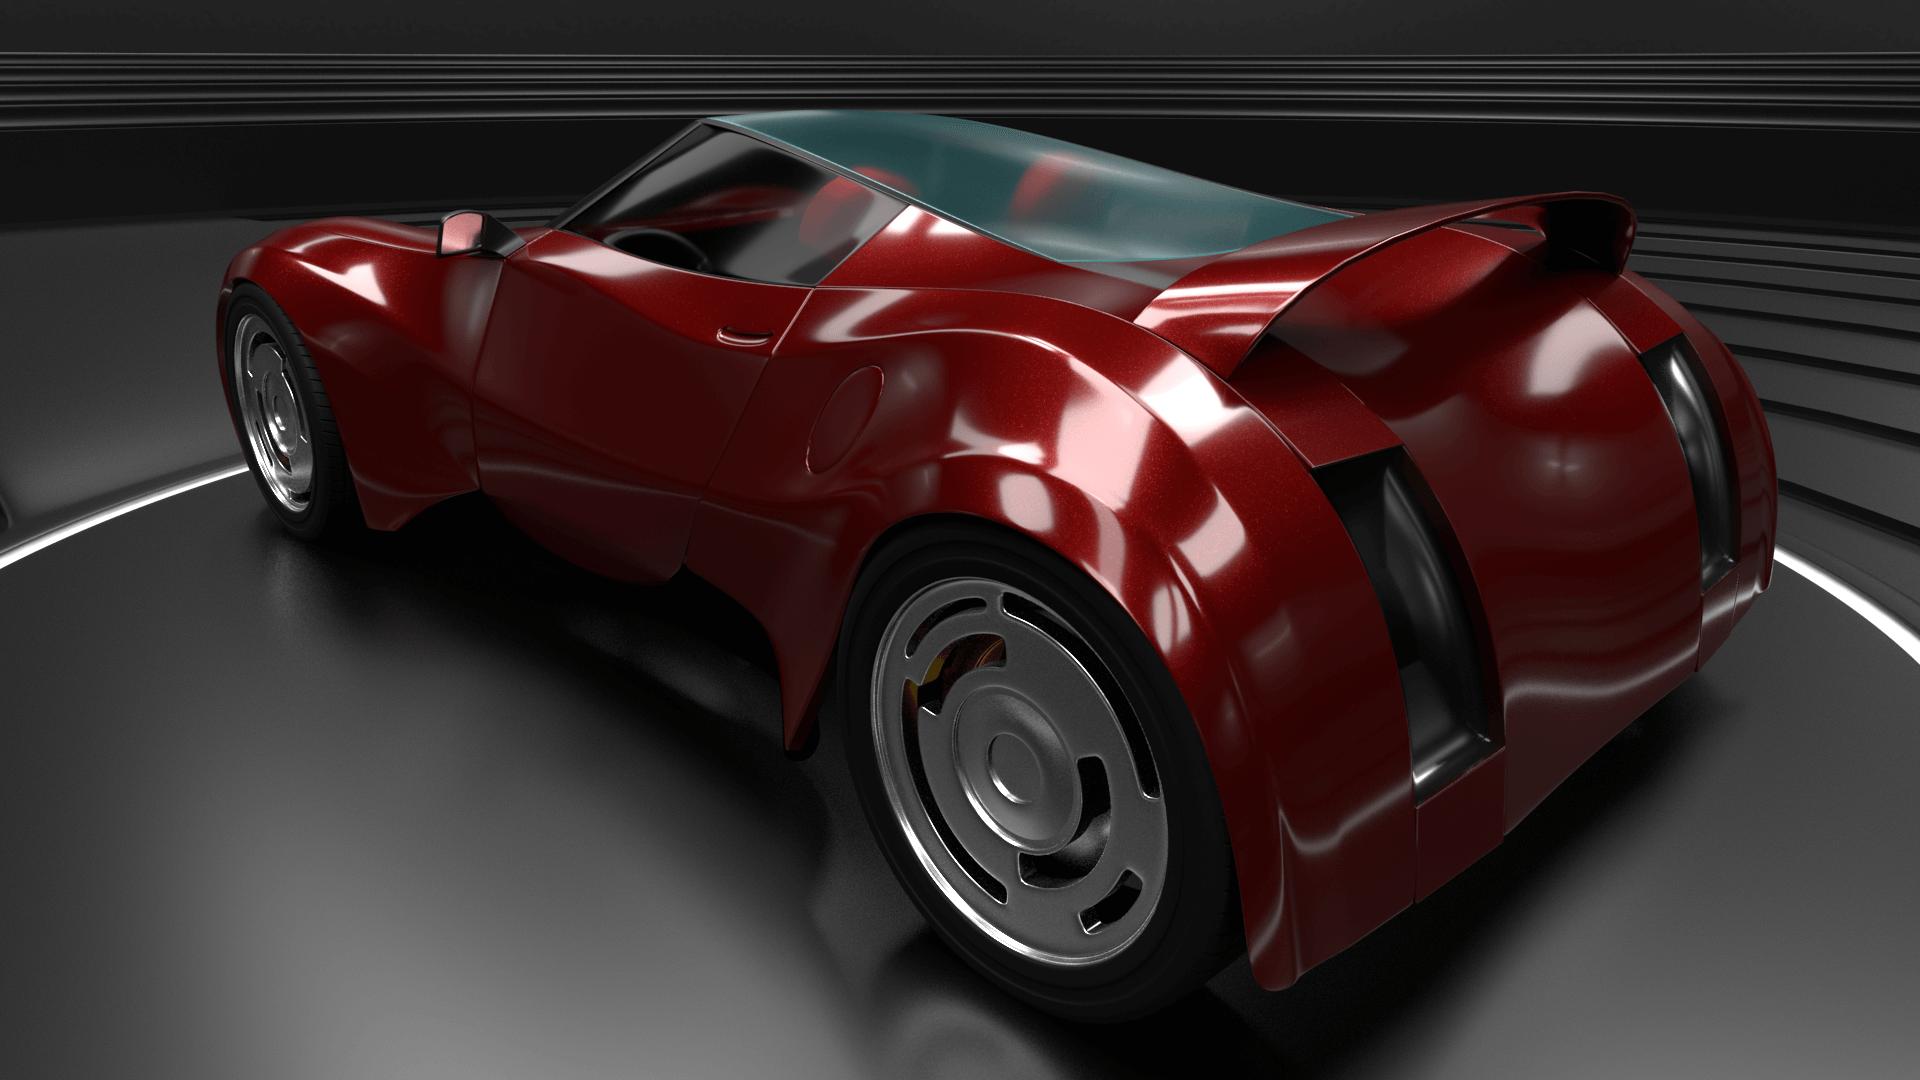 Fred Flintstone's car the Flintmobile as a supercar 3